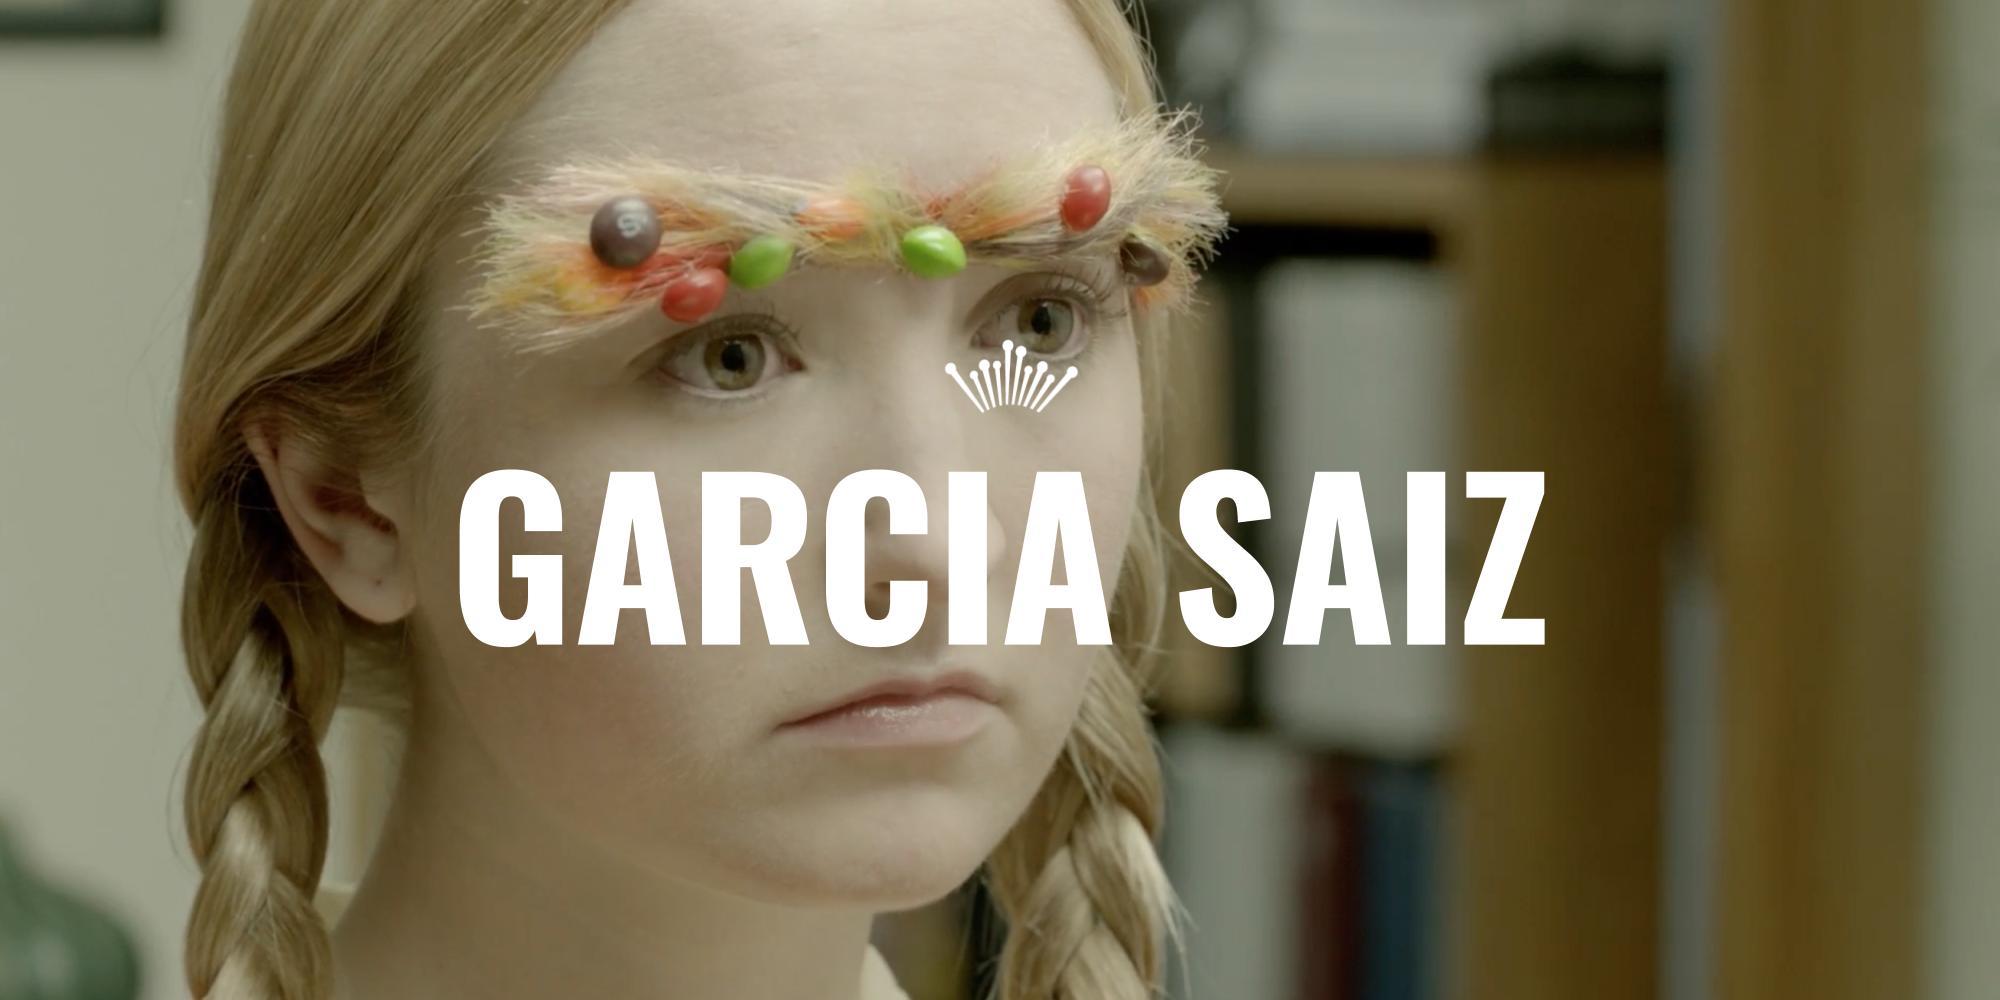 FRAME GARCIA SAIZ